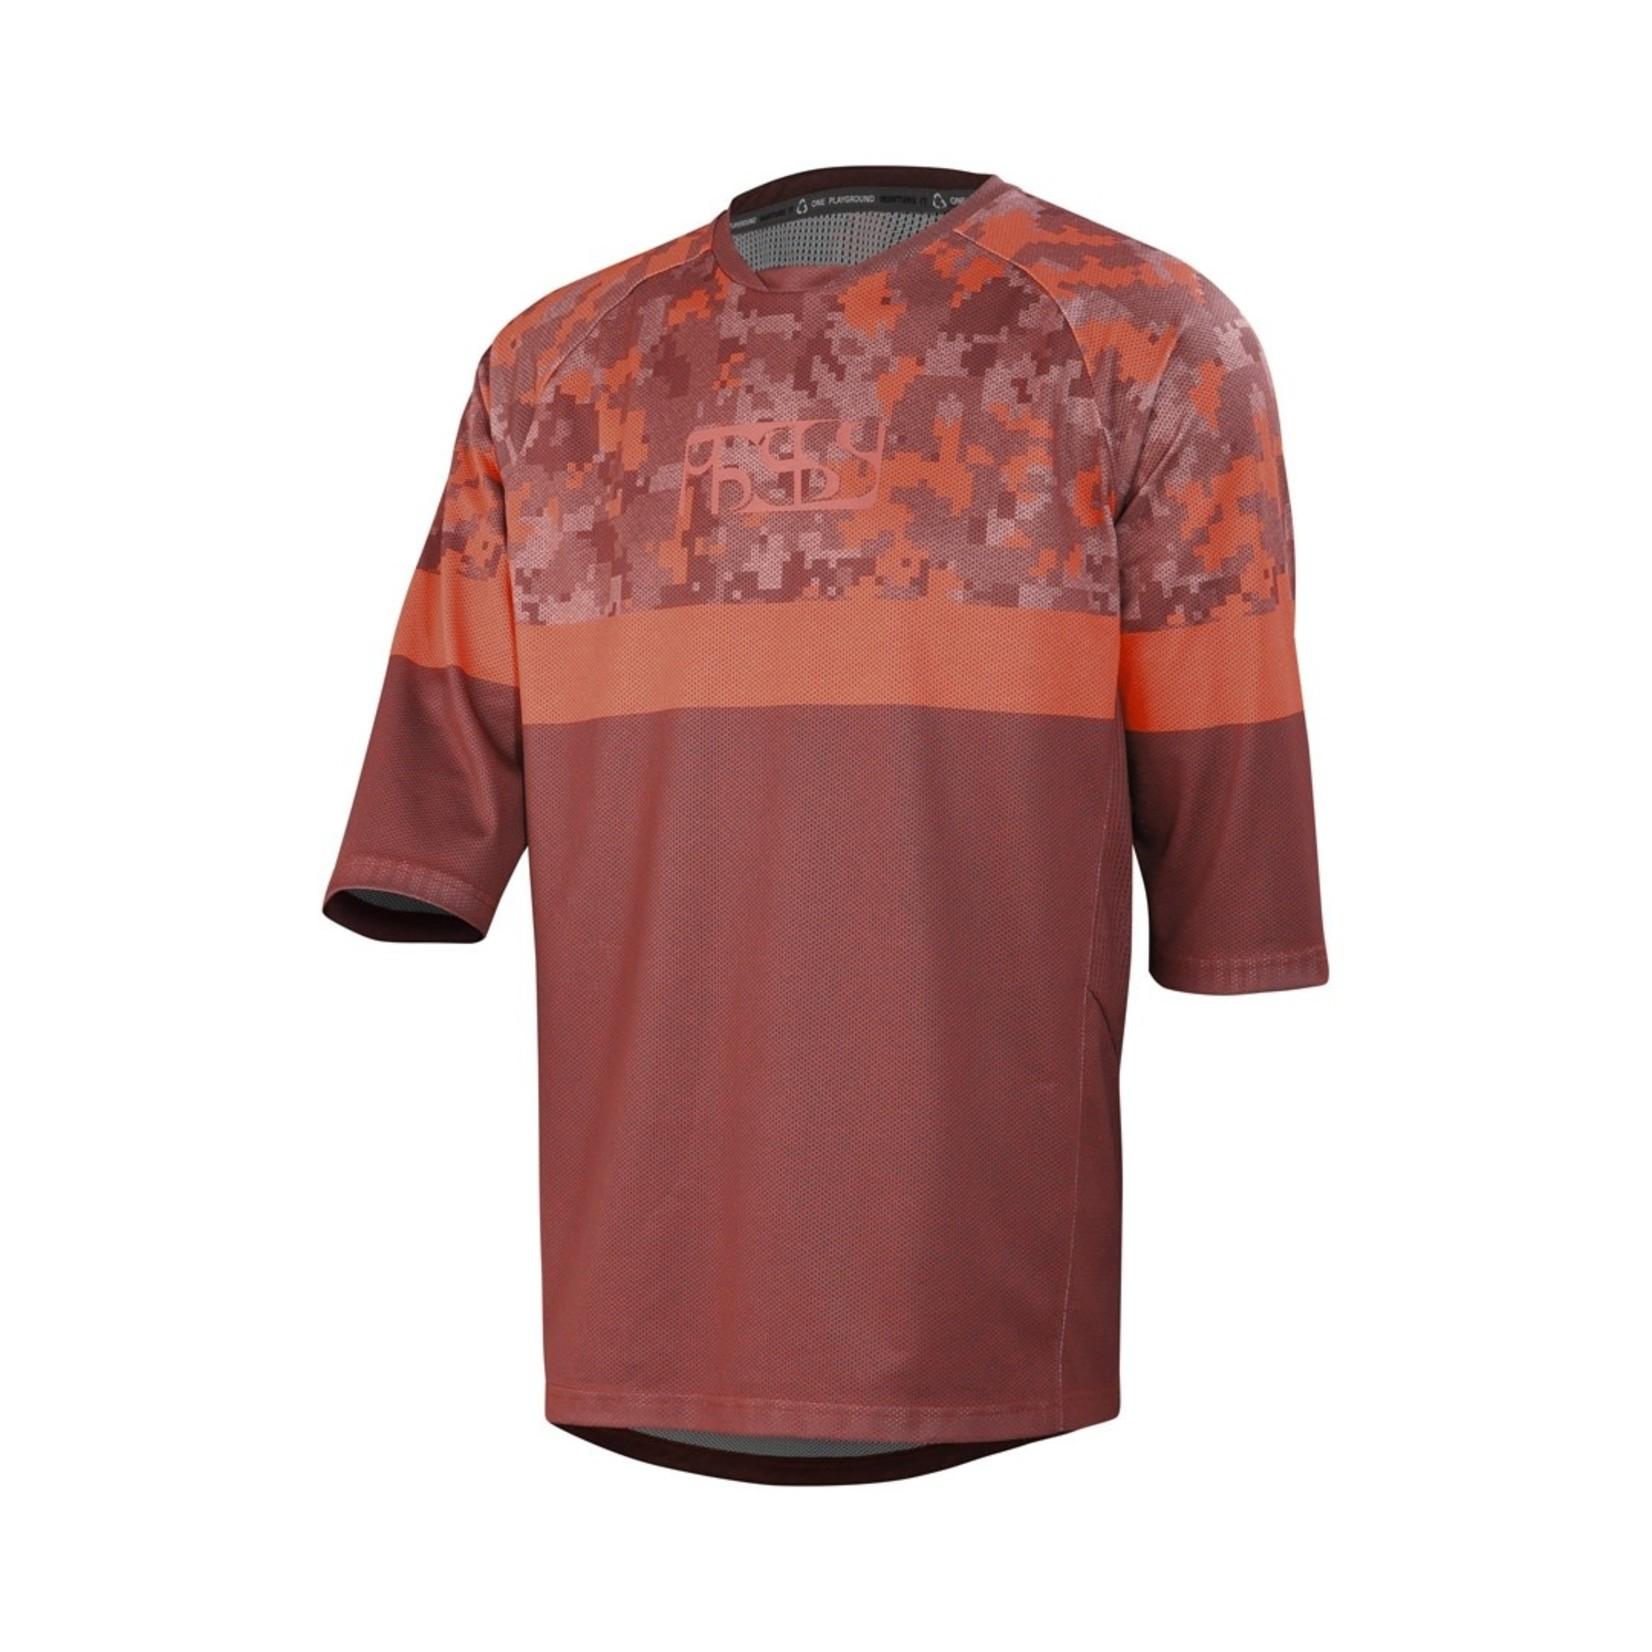 IXS IXS T-Shirt Carve Air Jersey Night Red Black (S)